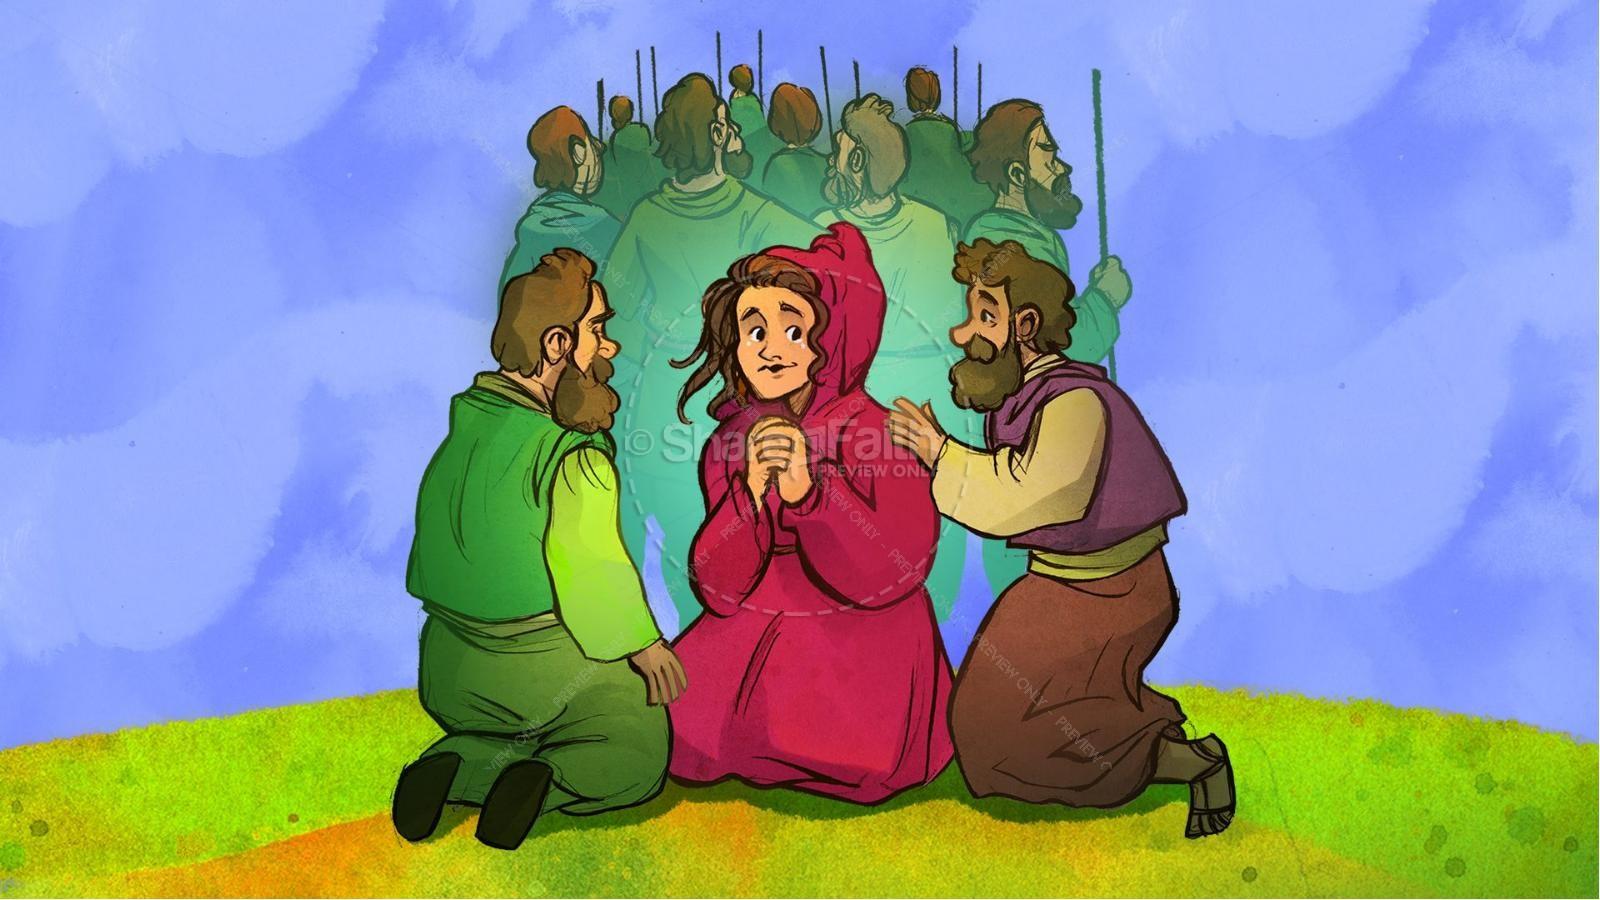 Joshua 2 The Story of Rahab Kids Bible Stories | slide 8